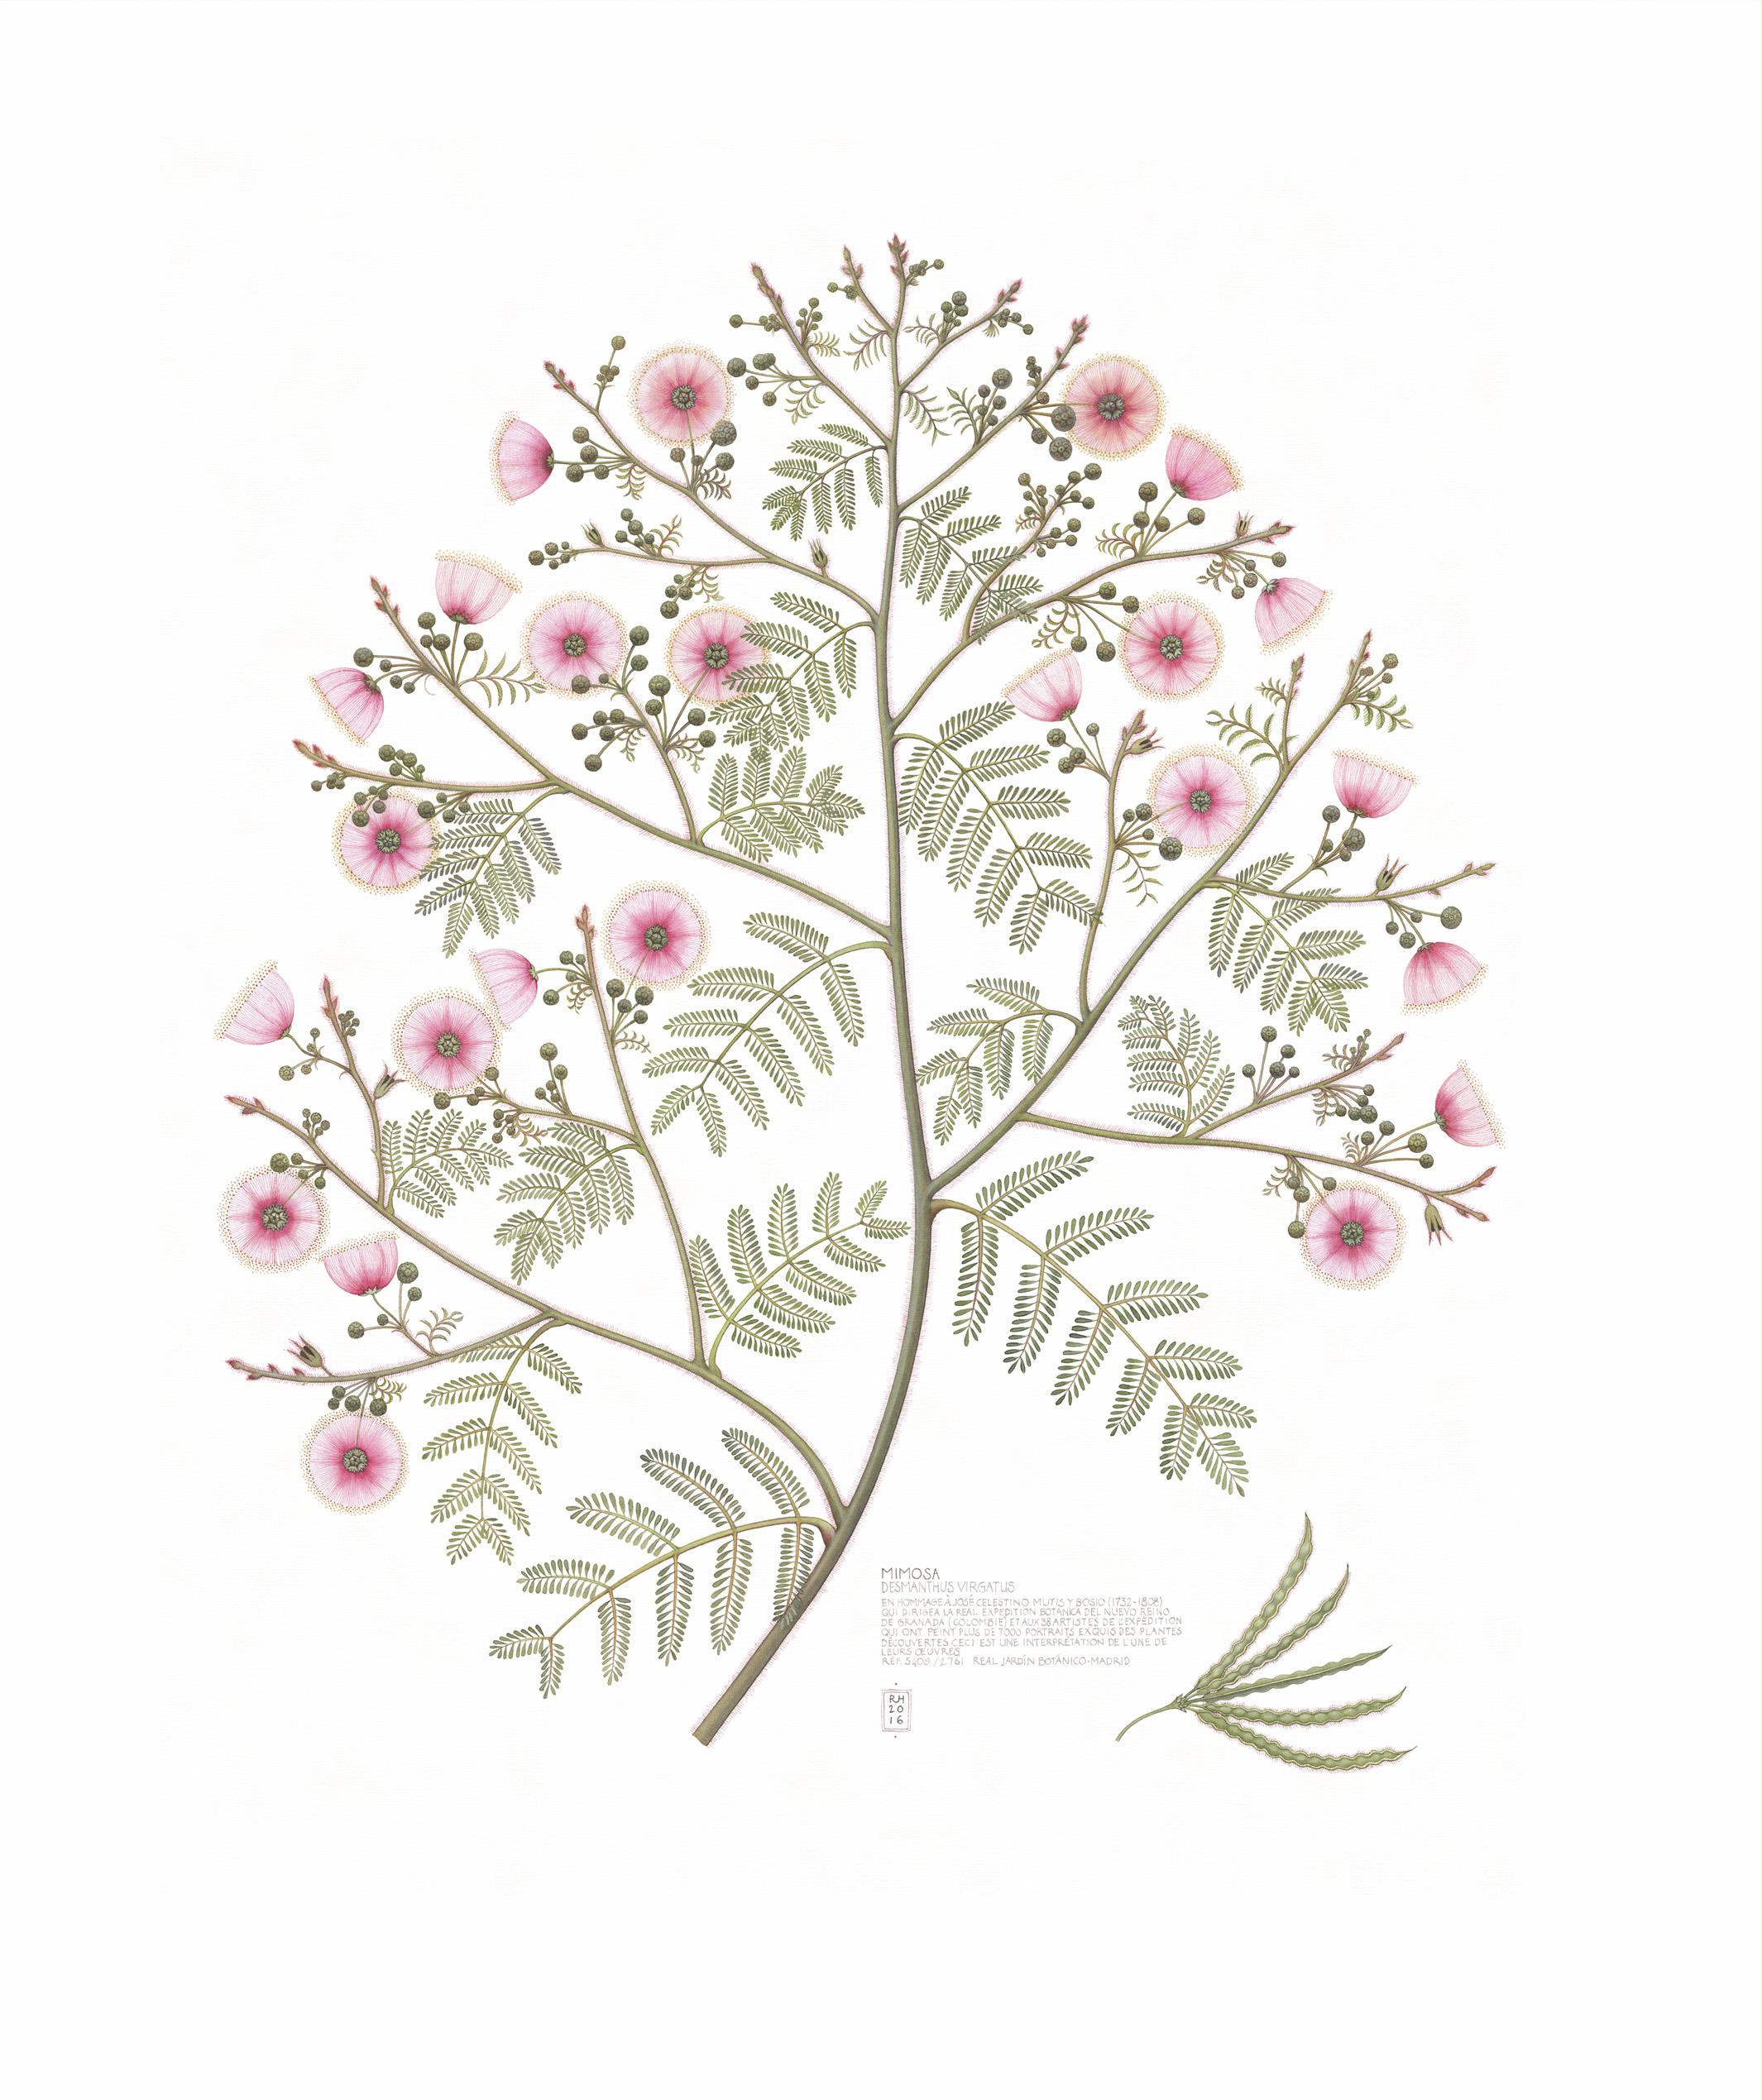 19. Mimosa